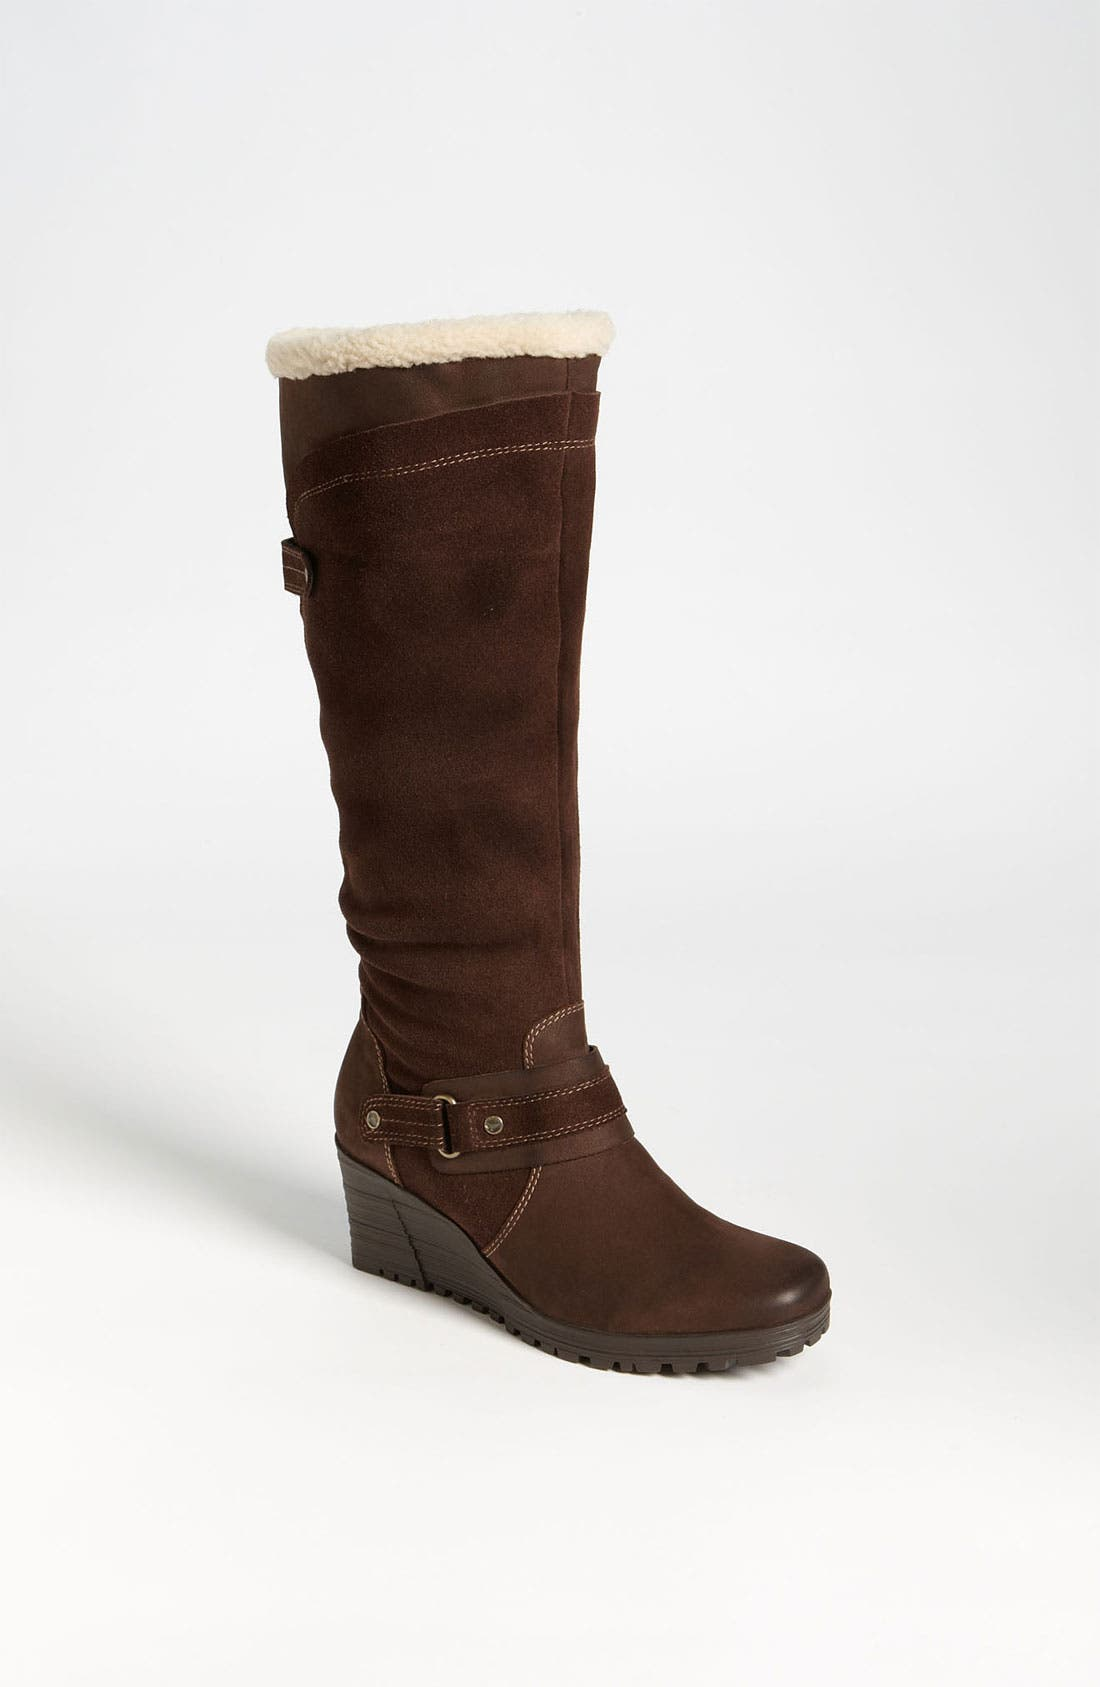 Alternate Image 1 Selected - Earth® 'Ridge' Boot